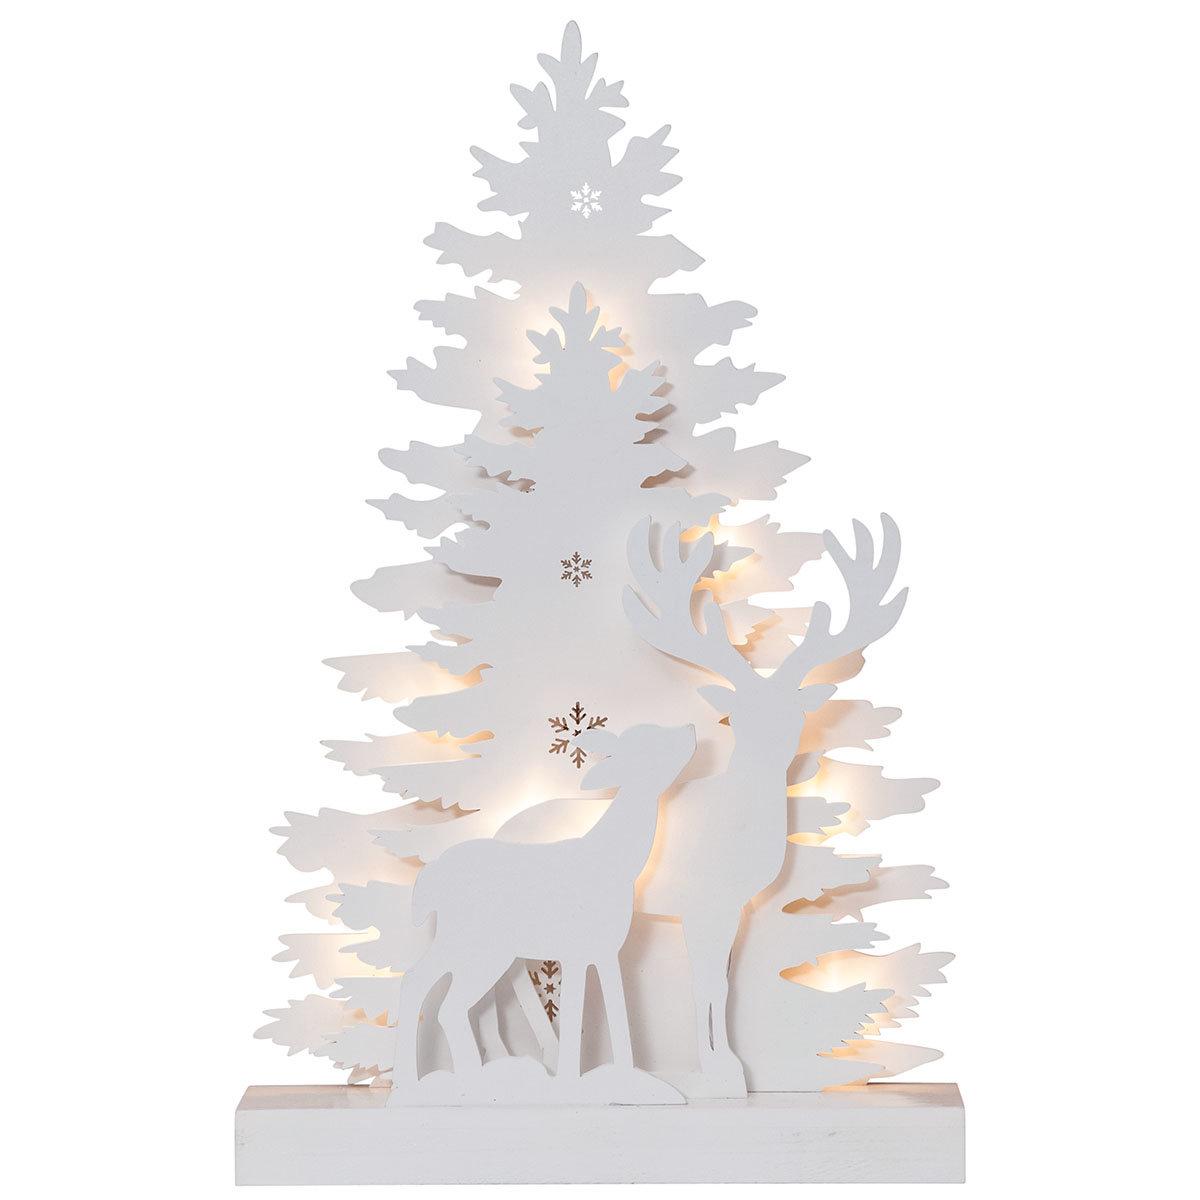 LED-Fensterleuchter Winter Emotion, 44x28x6 cm, Holz, weiß   #2